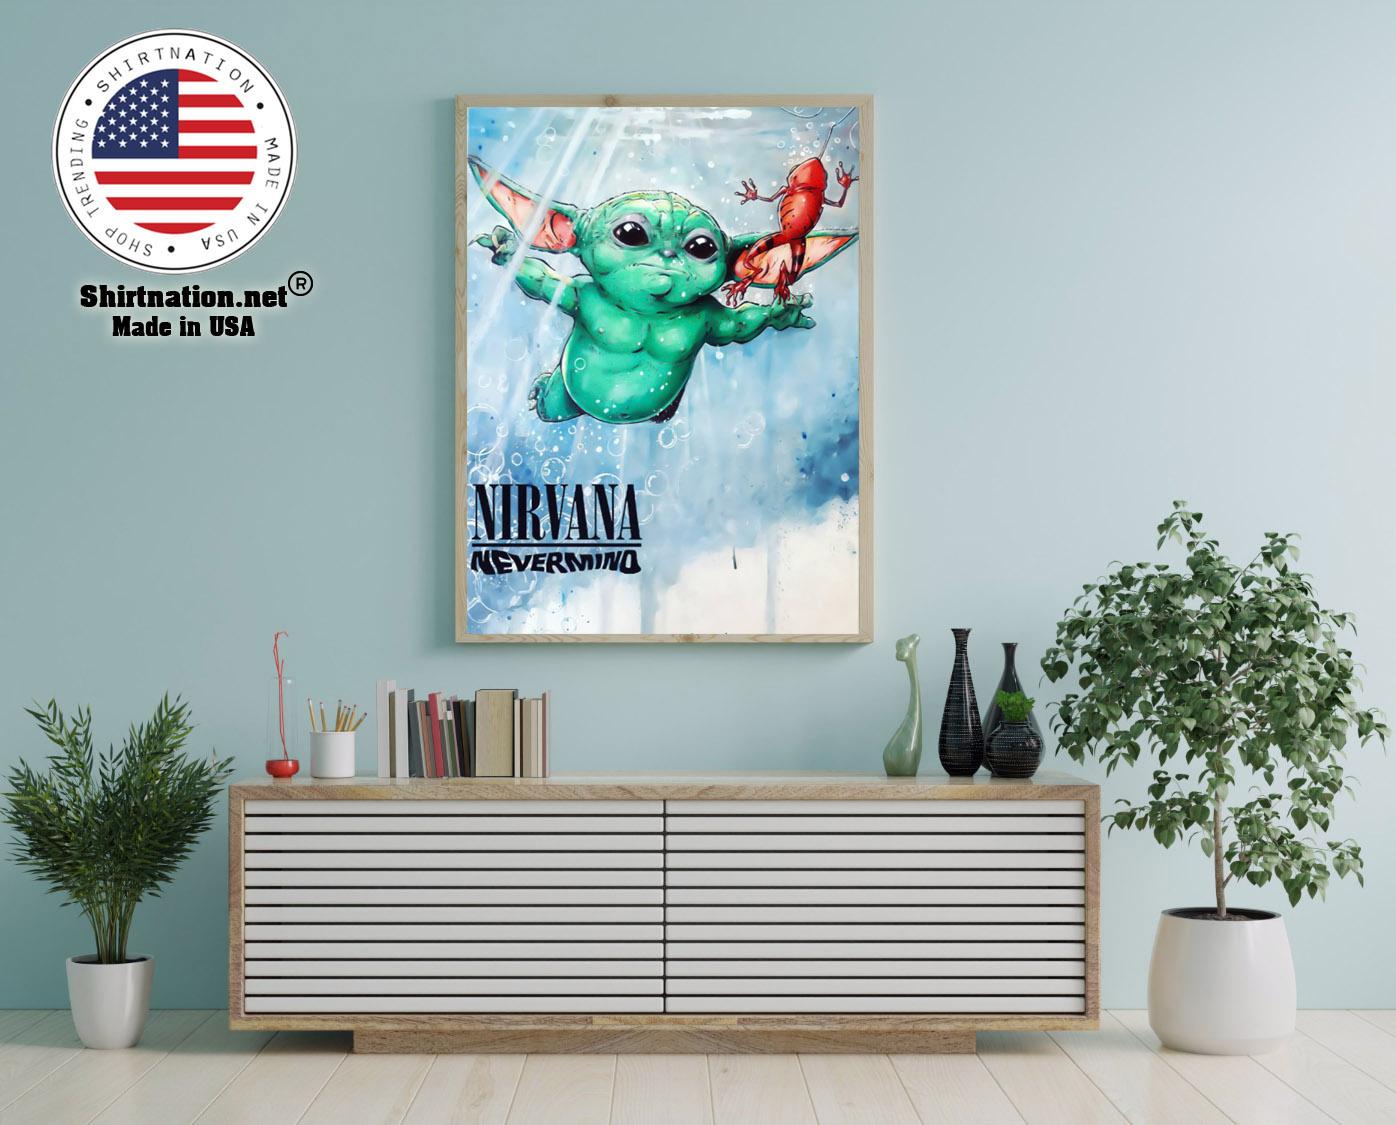 Baby Yoda nirvana never mind poster 12